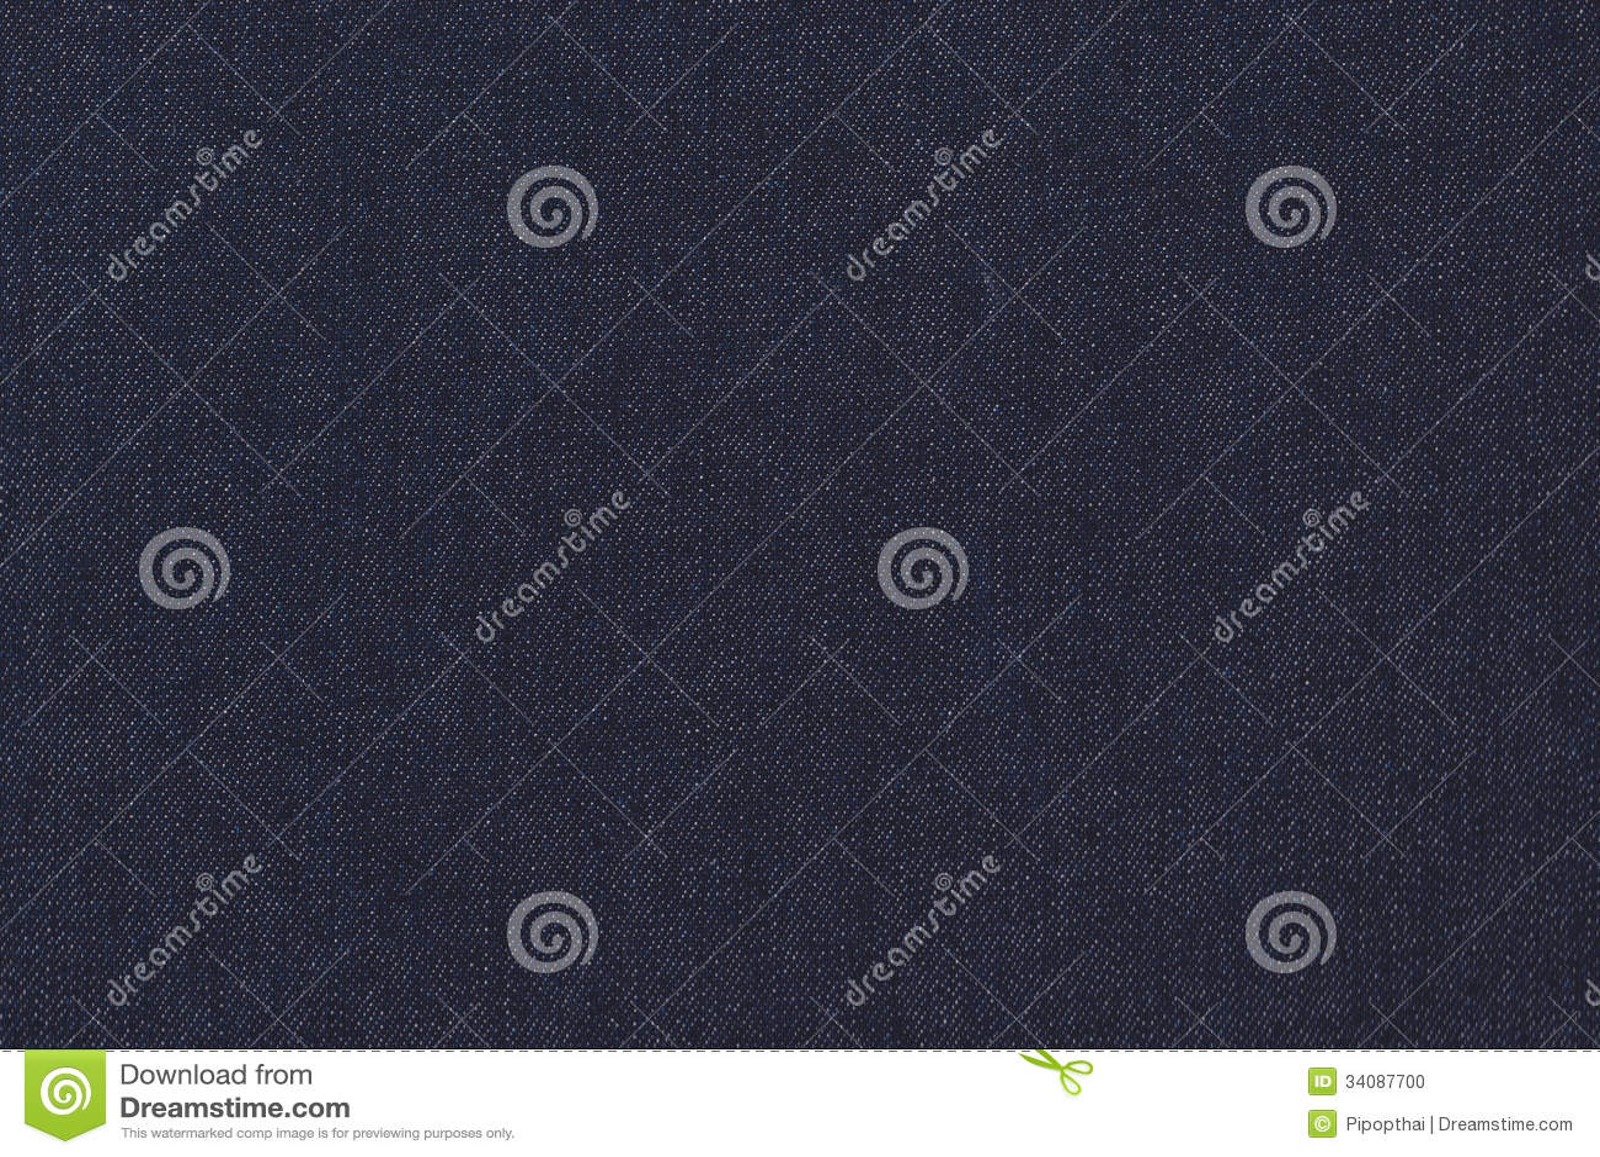 Denim Jeans texture background.